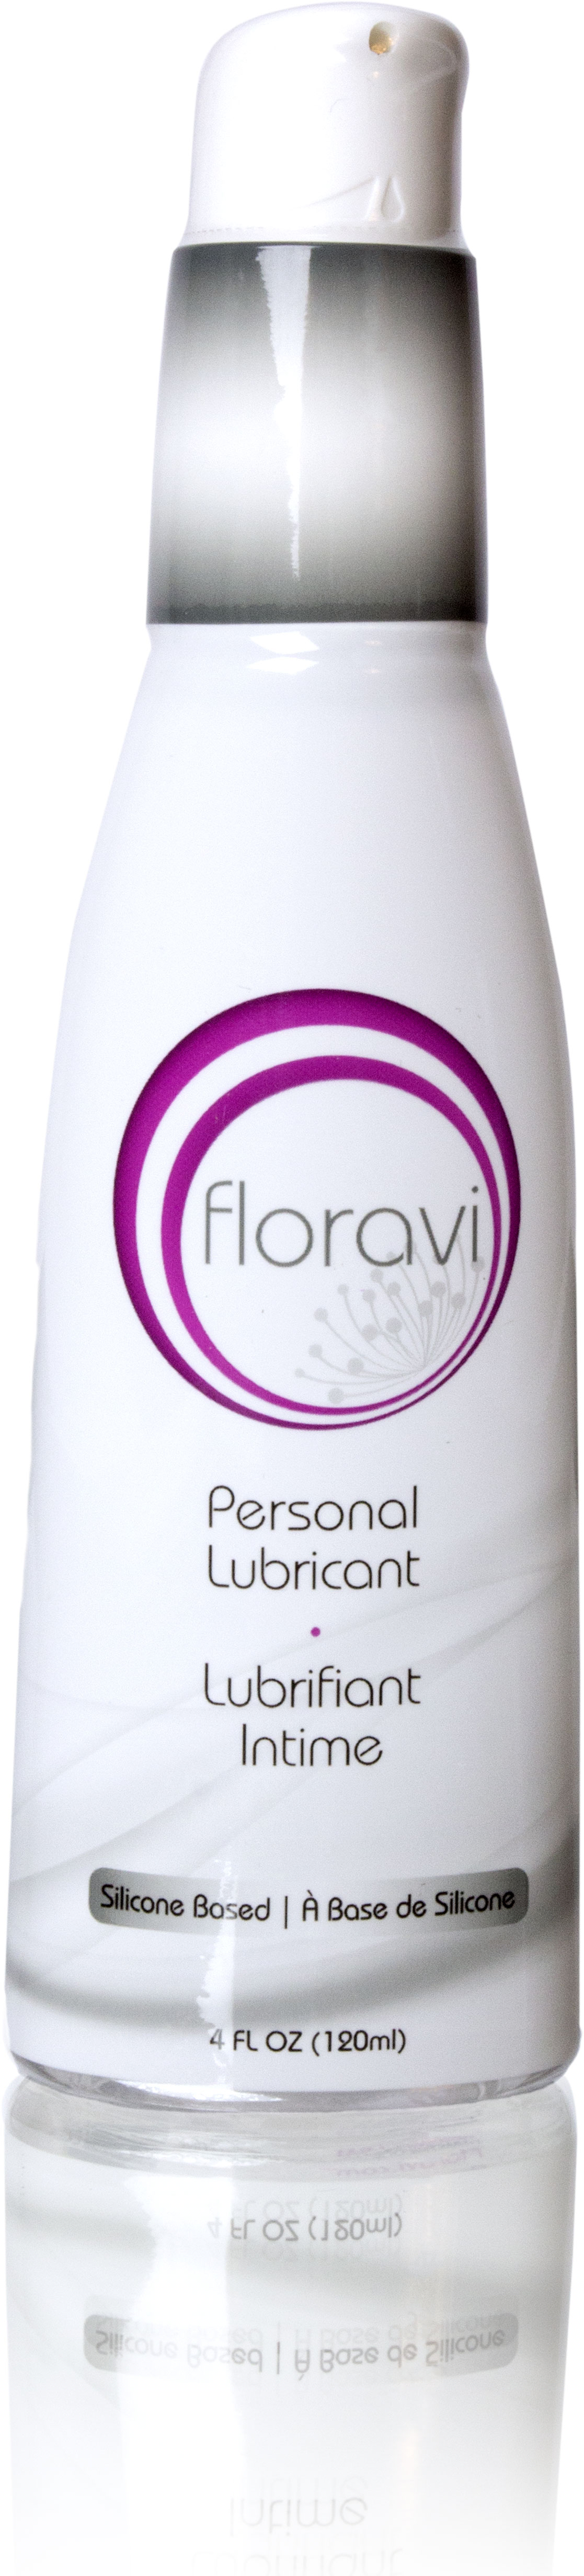 Floravi_SiliconeBased_reflet.jpg